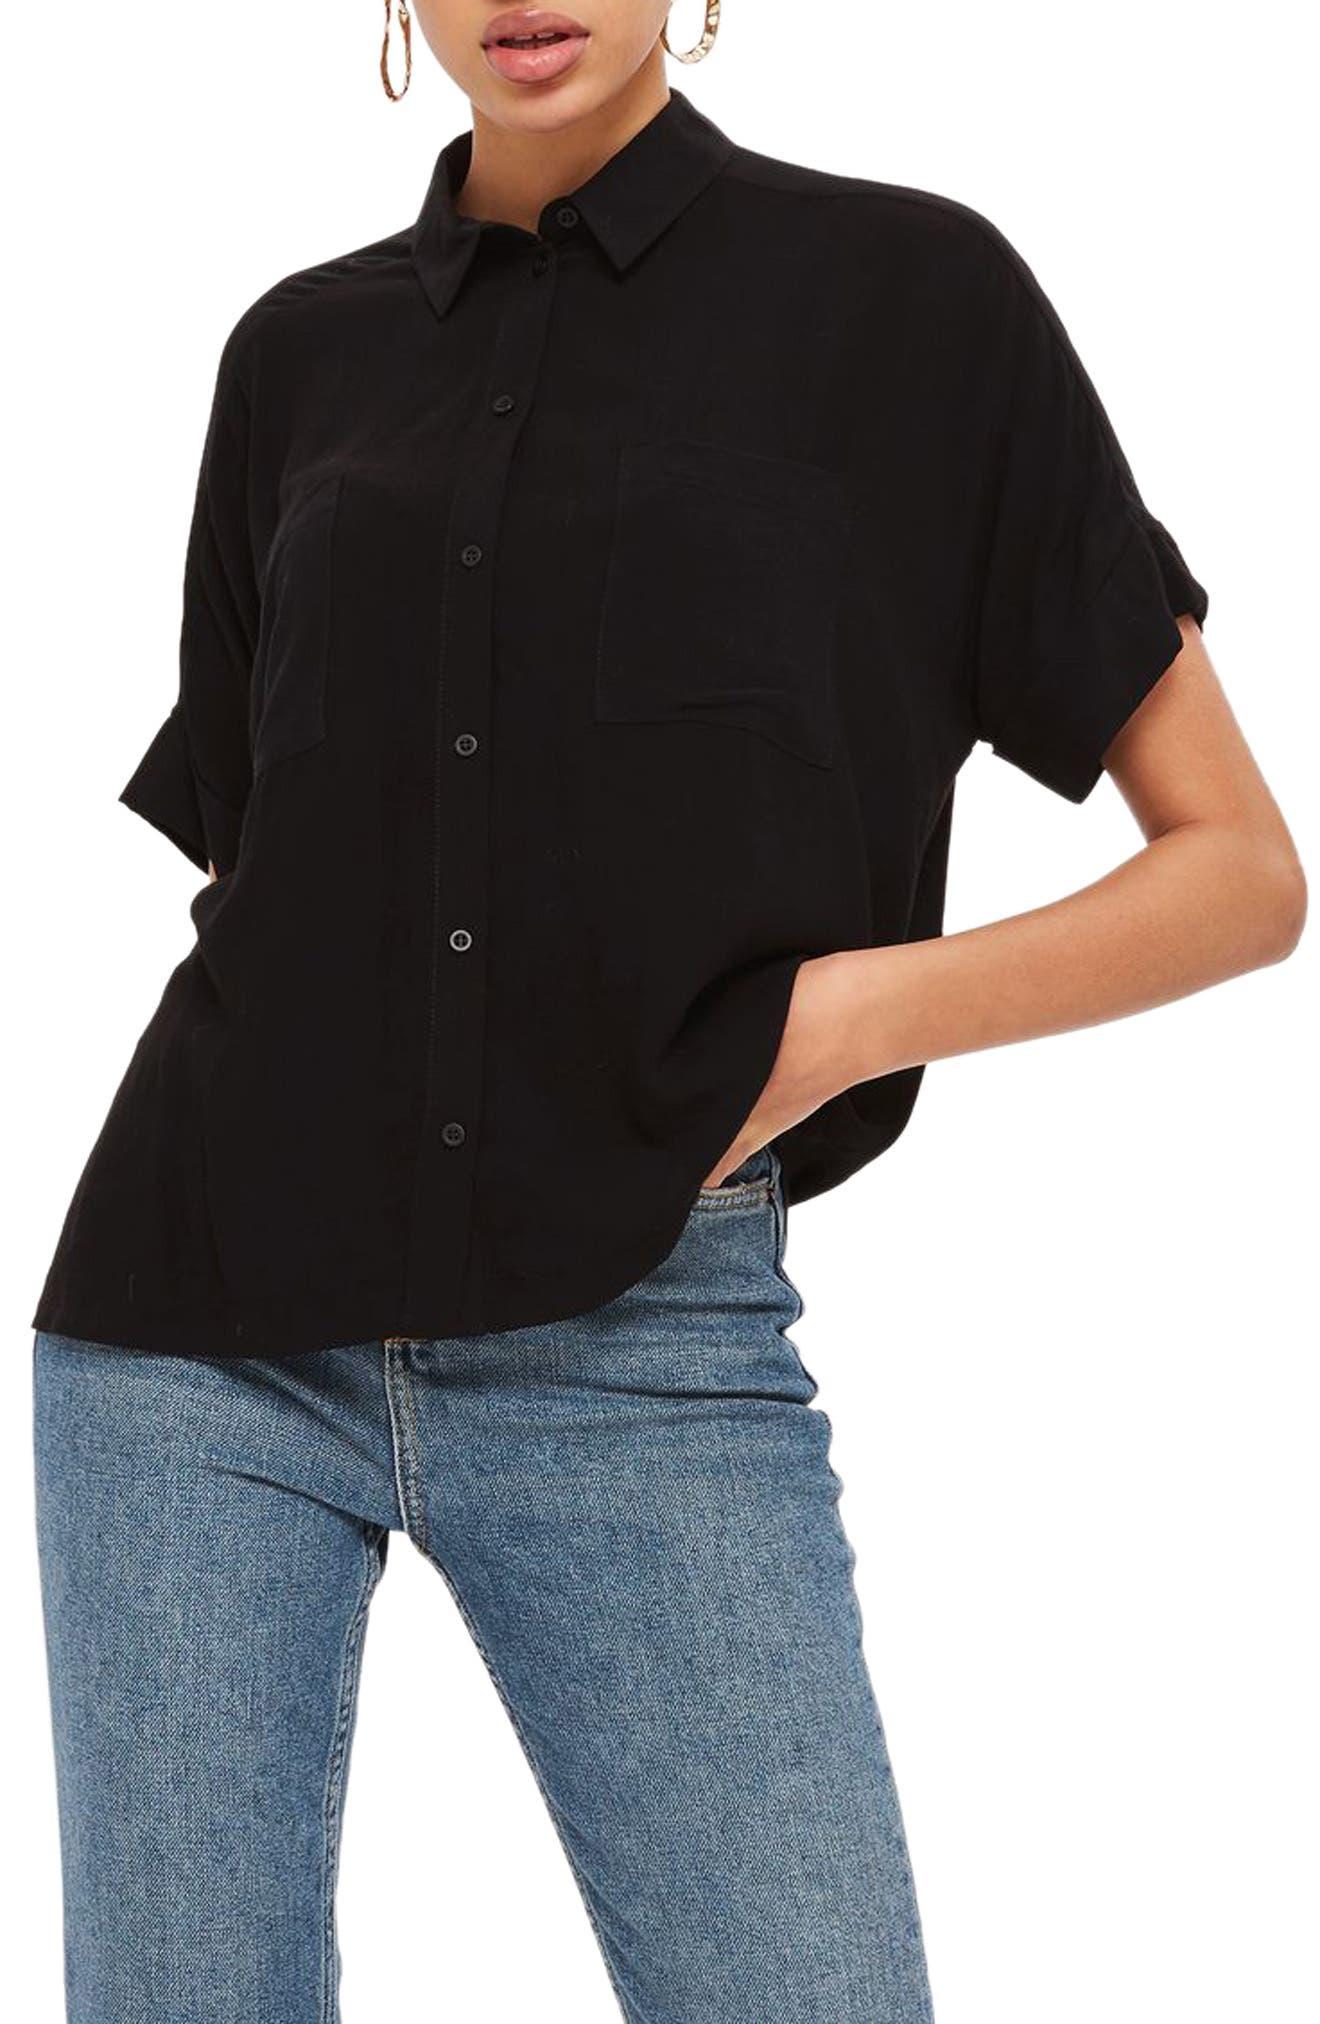 Joey Shirt,                         Main,                         color, Black